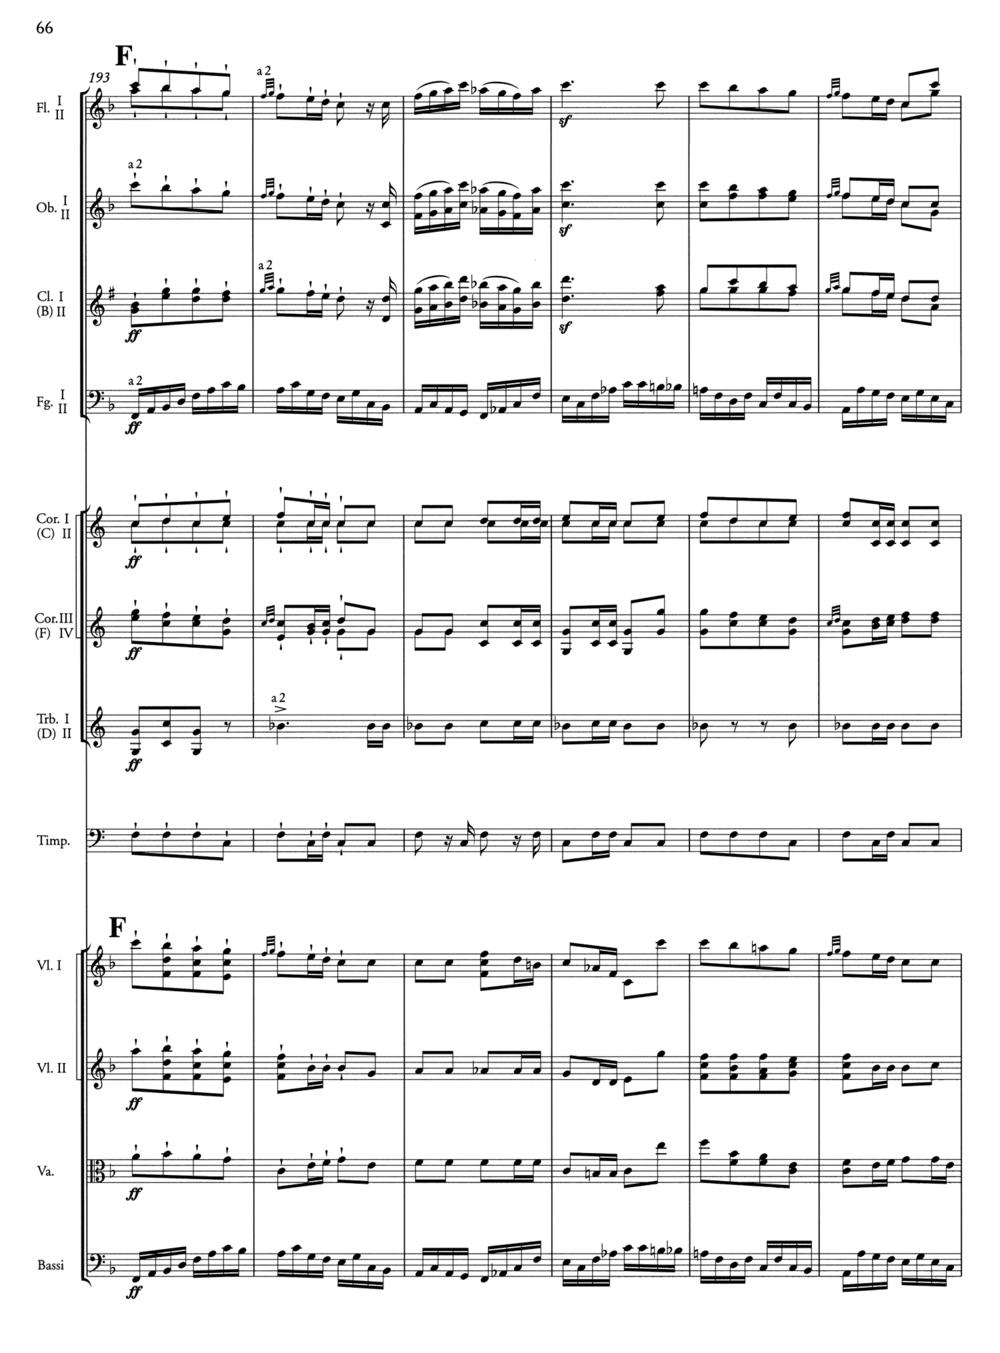 Mendelssohn Score 2 Page 2.jpg